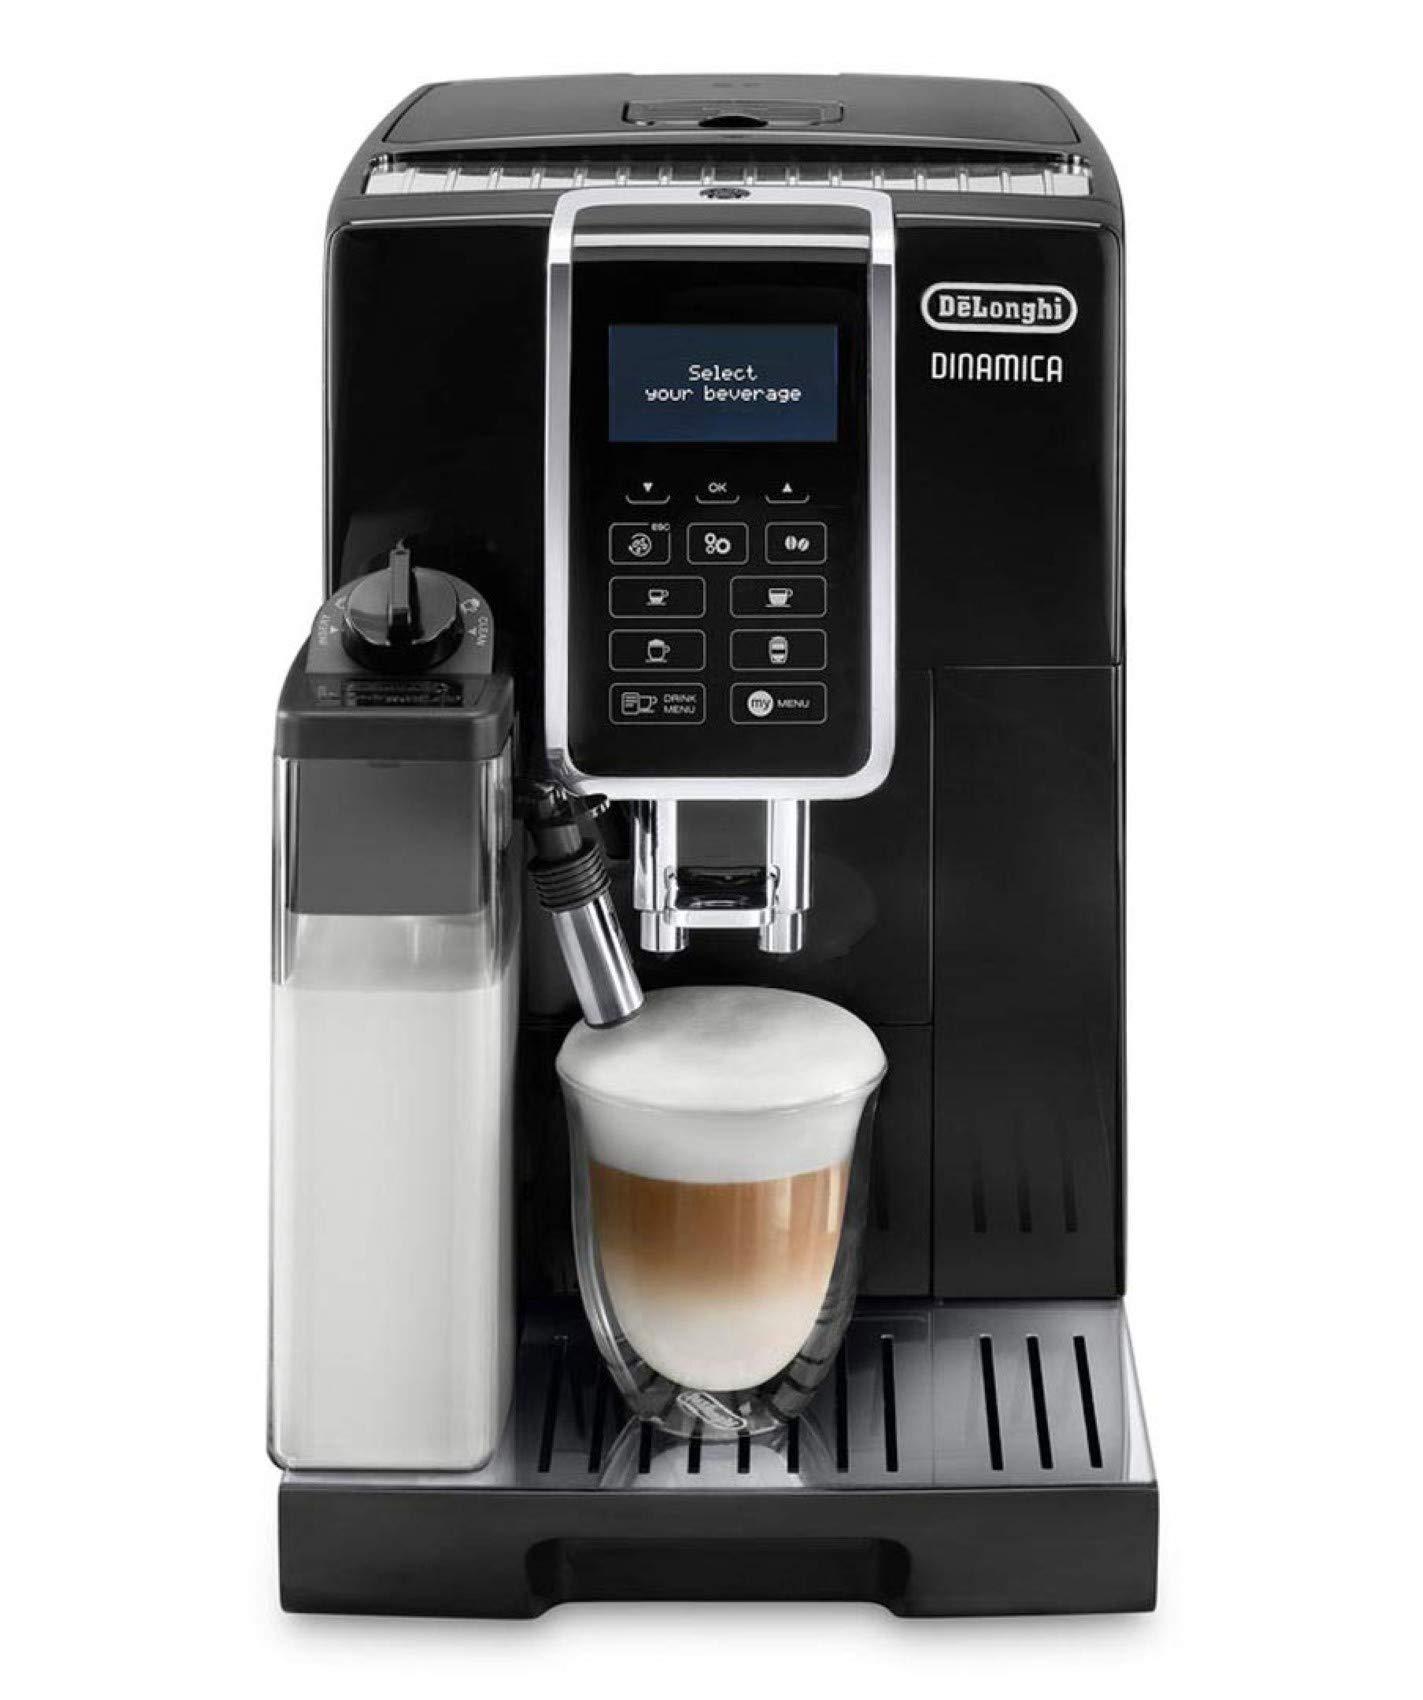 De'Longhi ECAM 350.55.B Dinamica Kaffeevollautomat (Milchsystem) schwarz